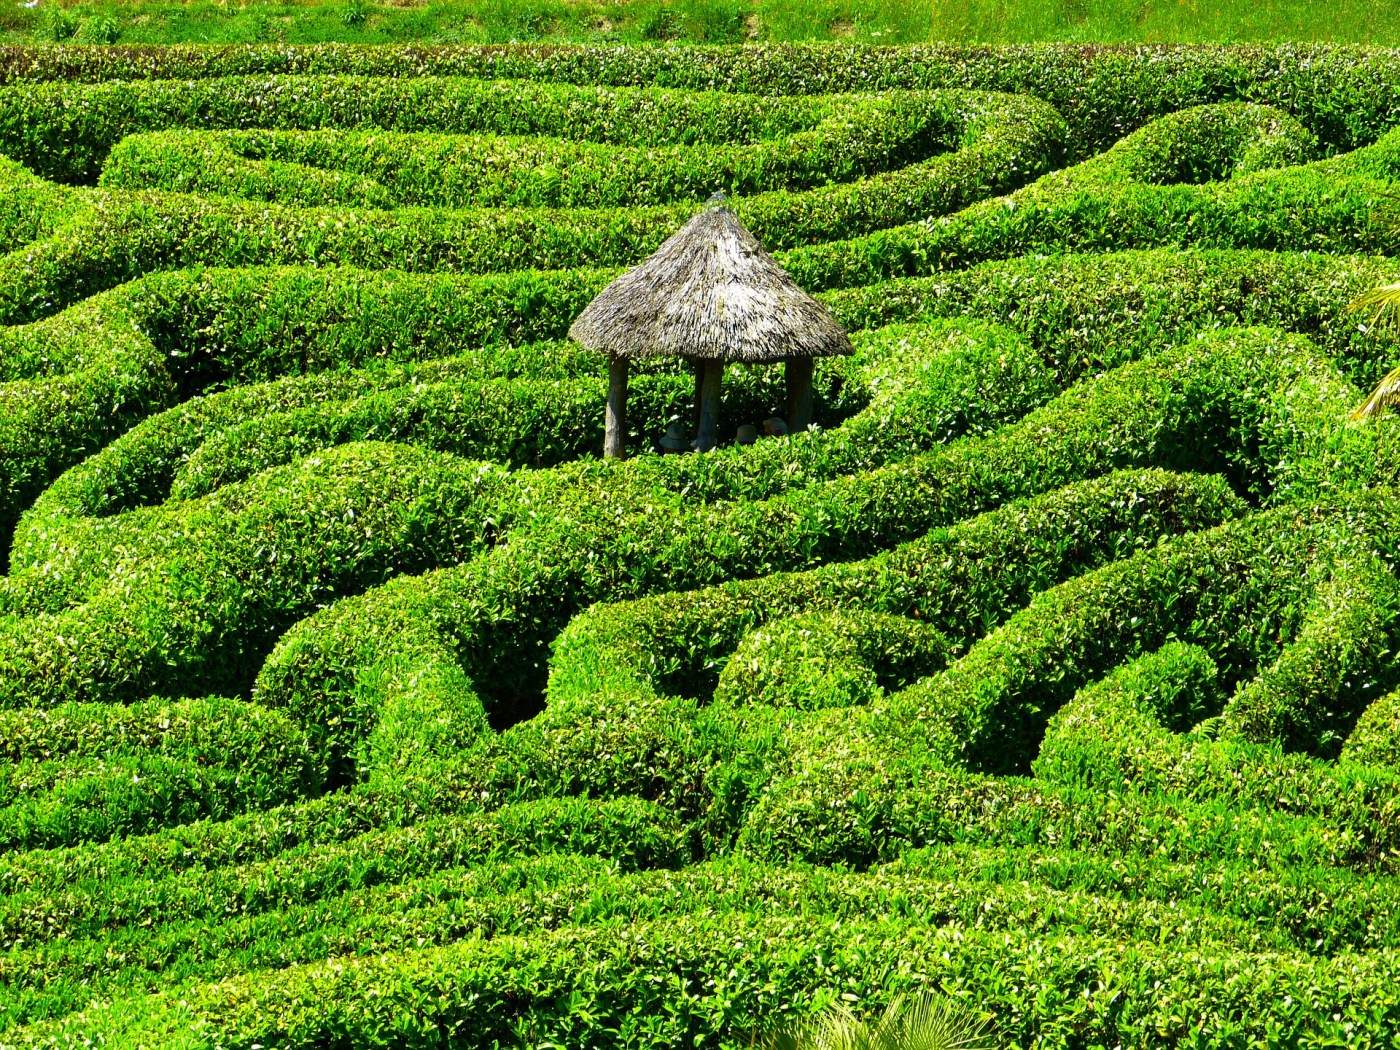 Labyrinth of life